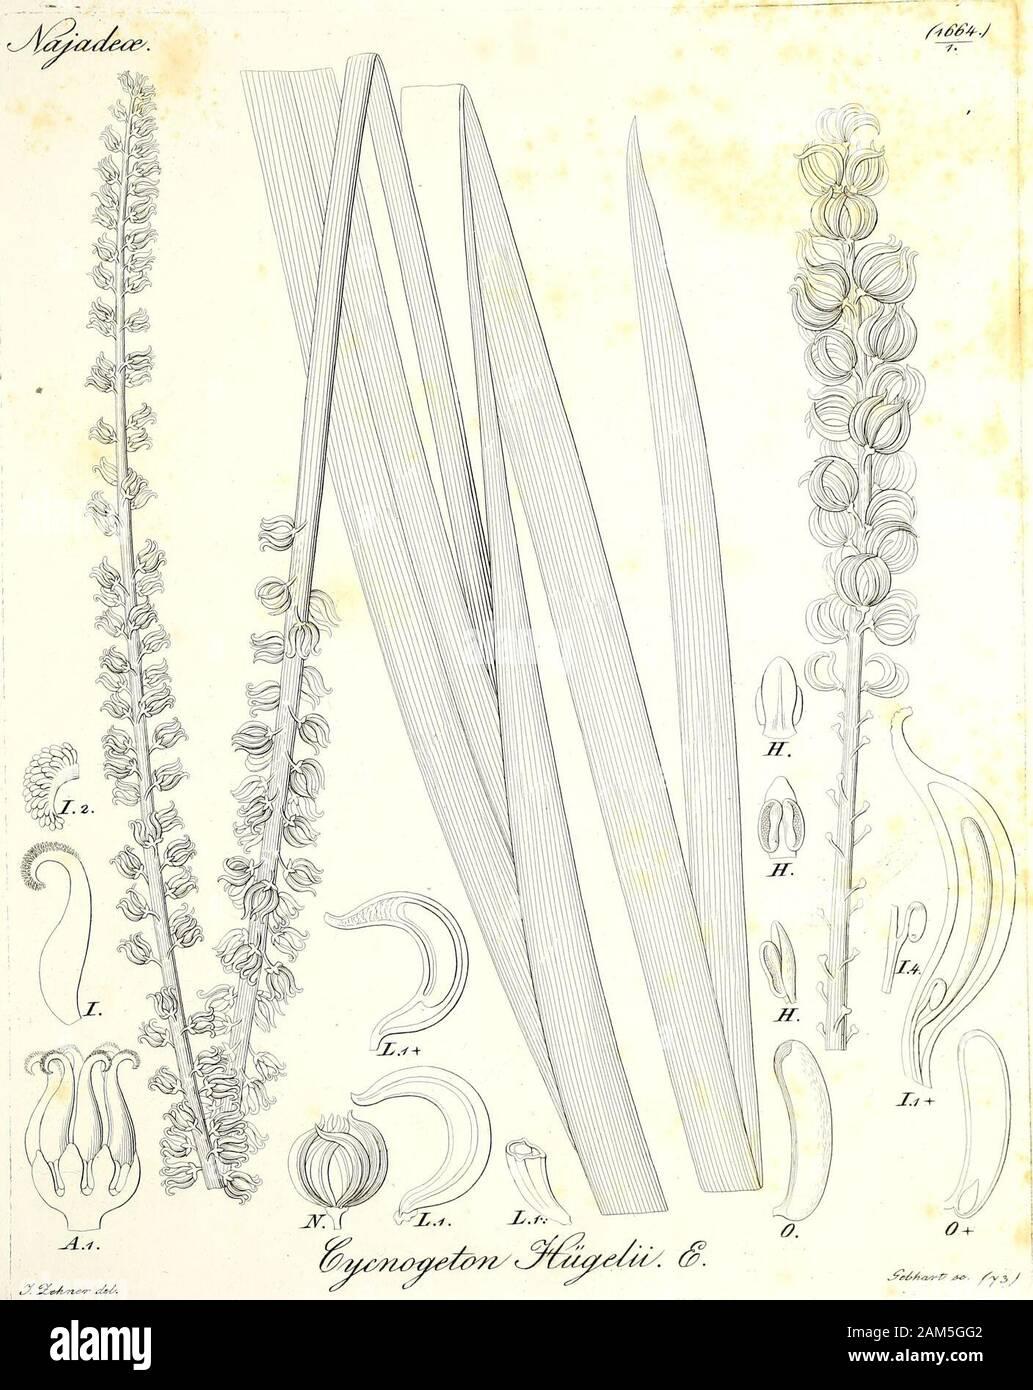 Iconographia generum plantarum . j£ ^vs&^/^/- ^. 3birfiJa#iZik^ s. /sWrAasrt Jc. /y 2,/. ytd-A&rt? <&& ? /y 3 J ^^Mi^autce^. Stock Photo